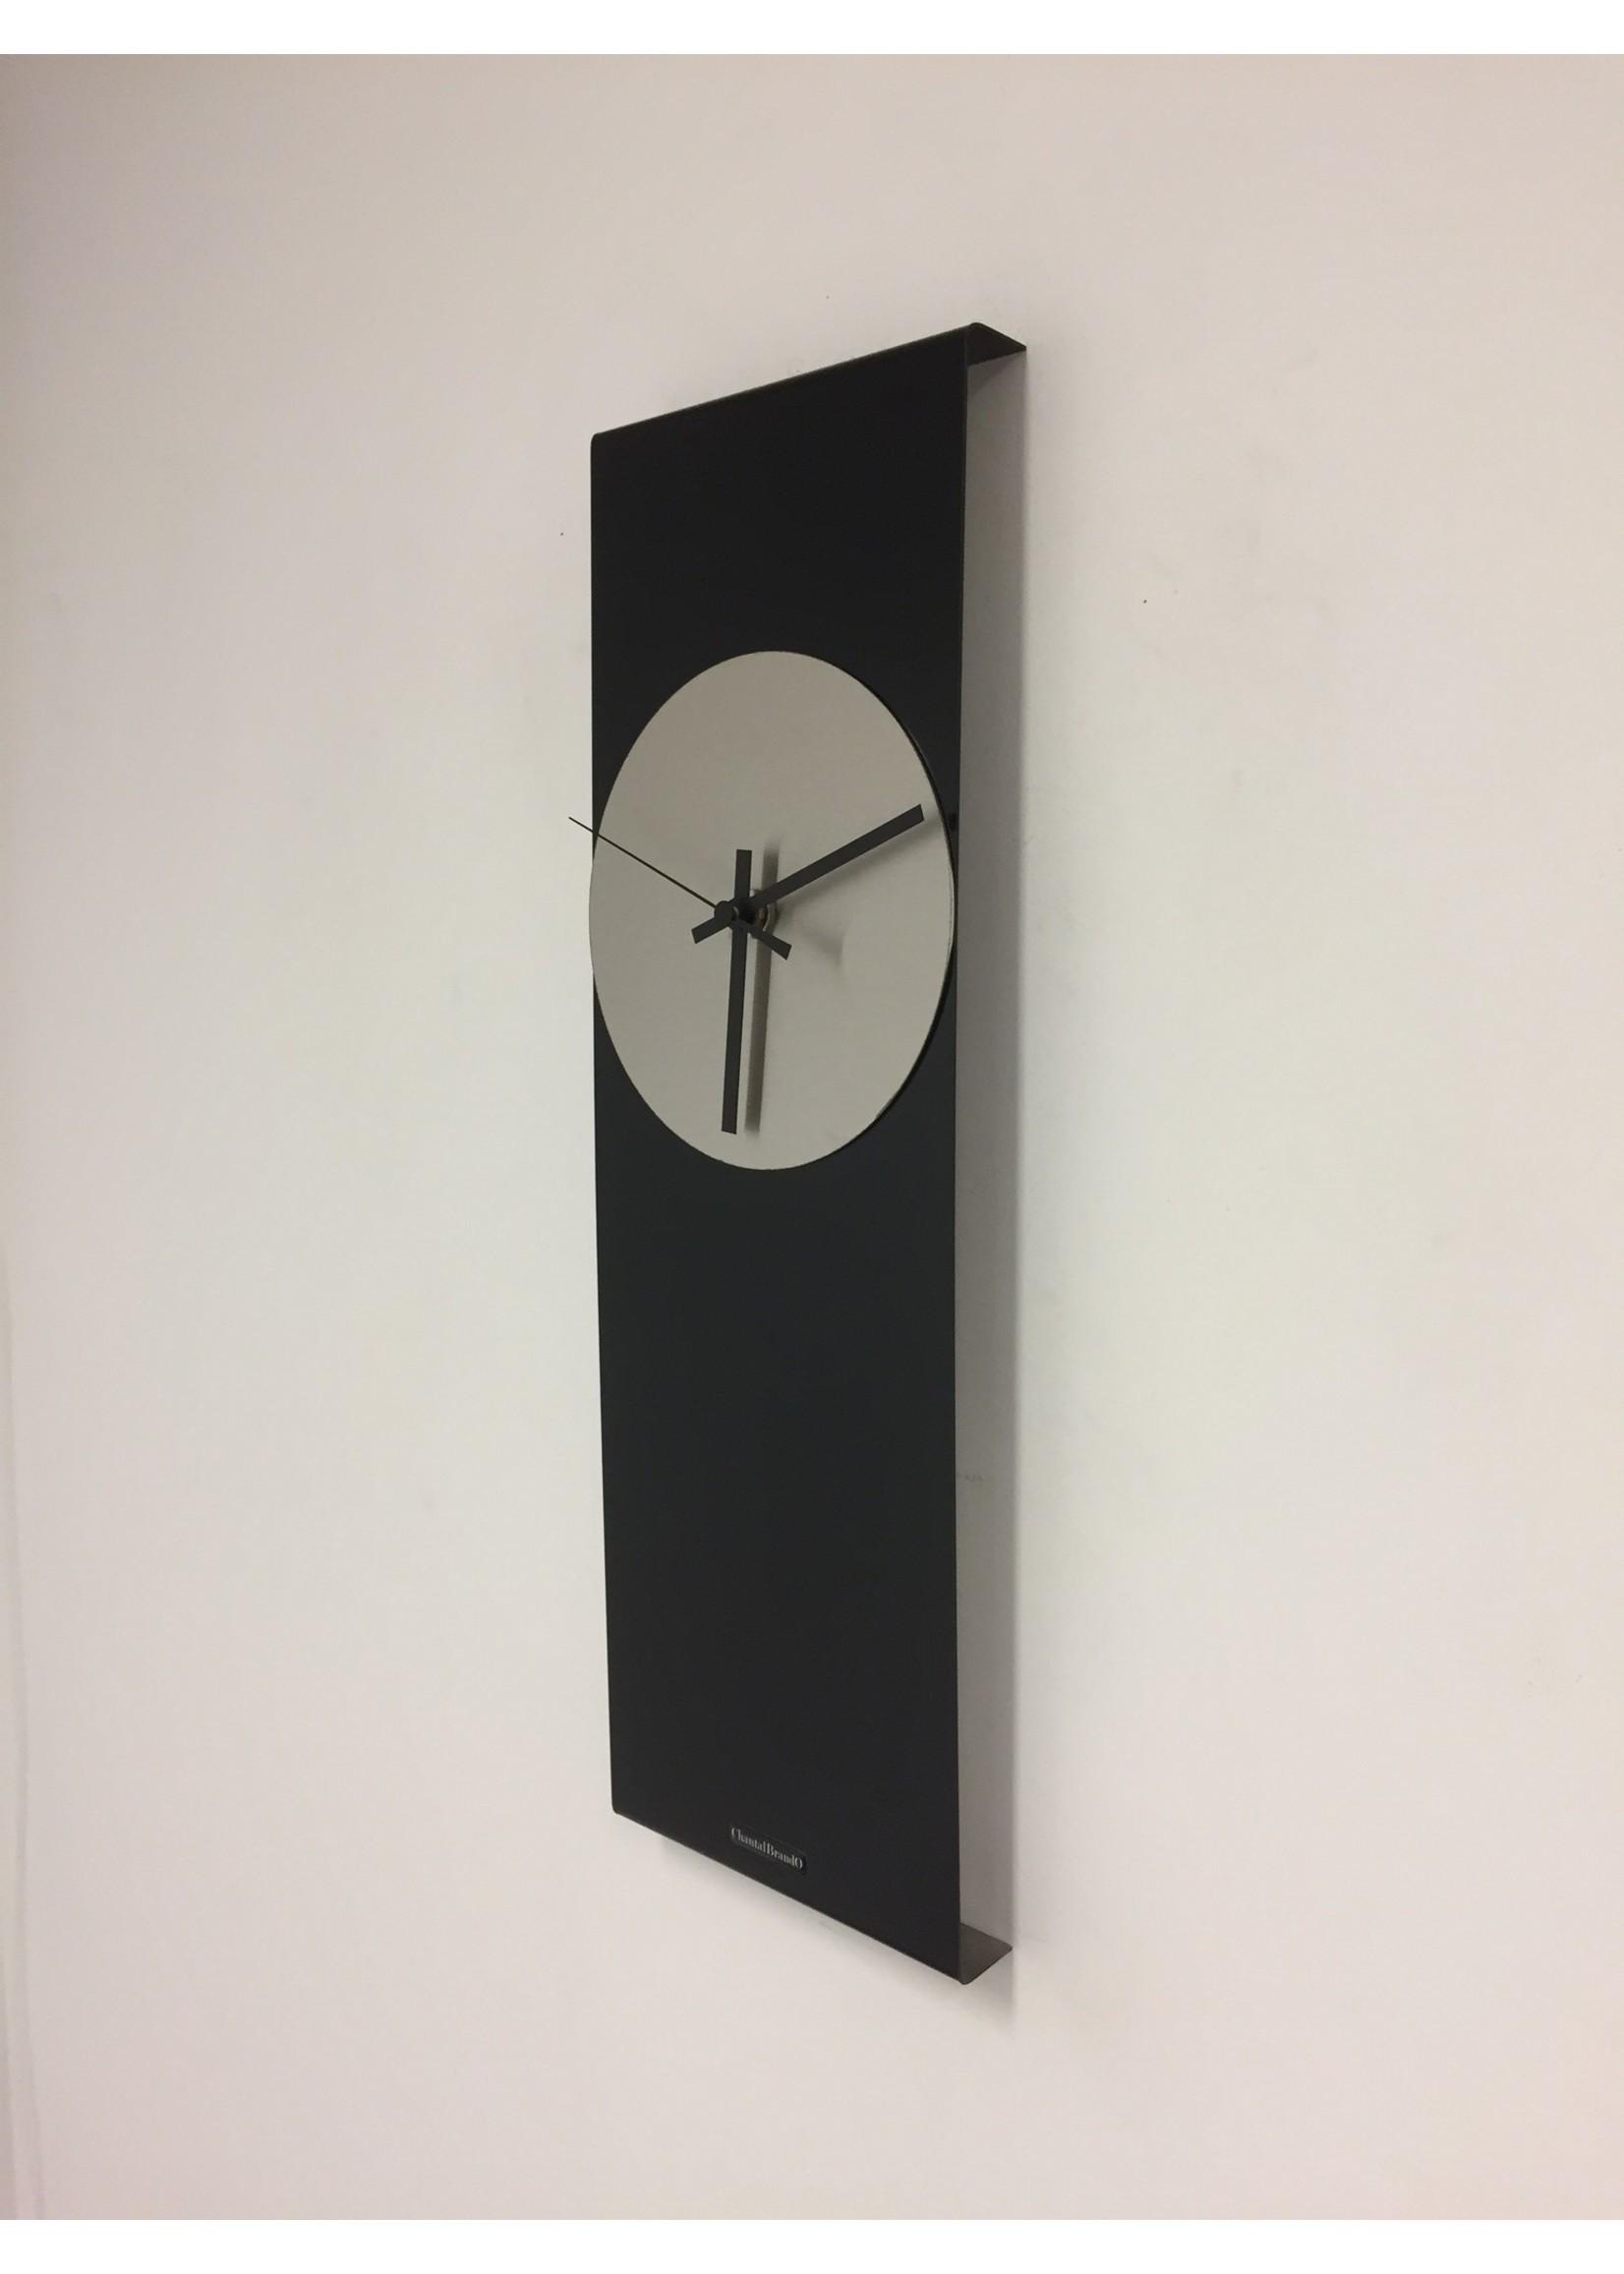 Klokkendiscounter Wandklok LaBrand Export Design Black I